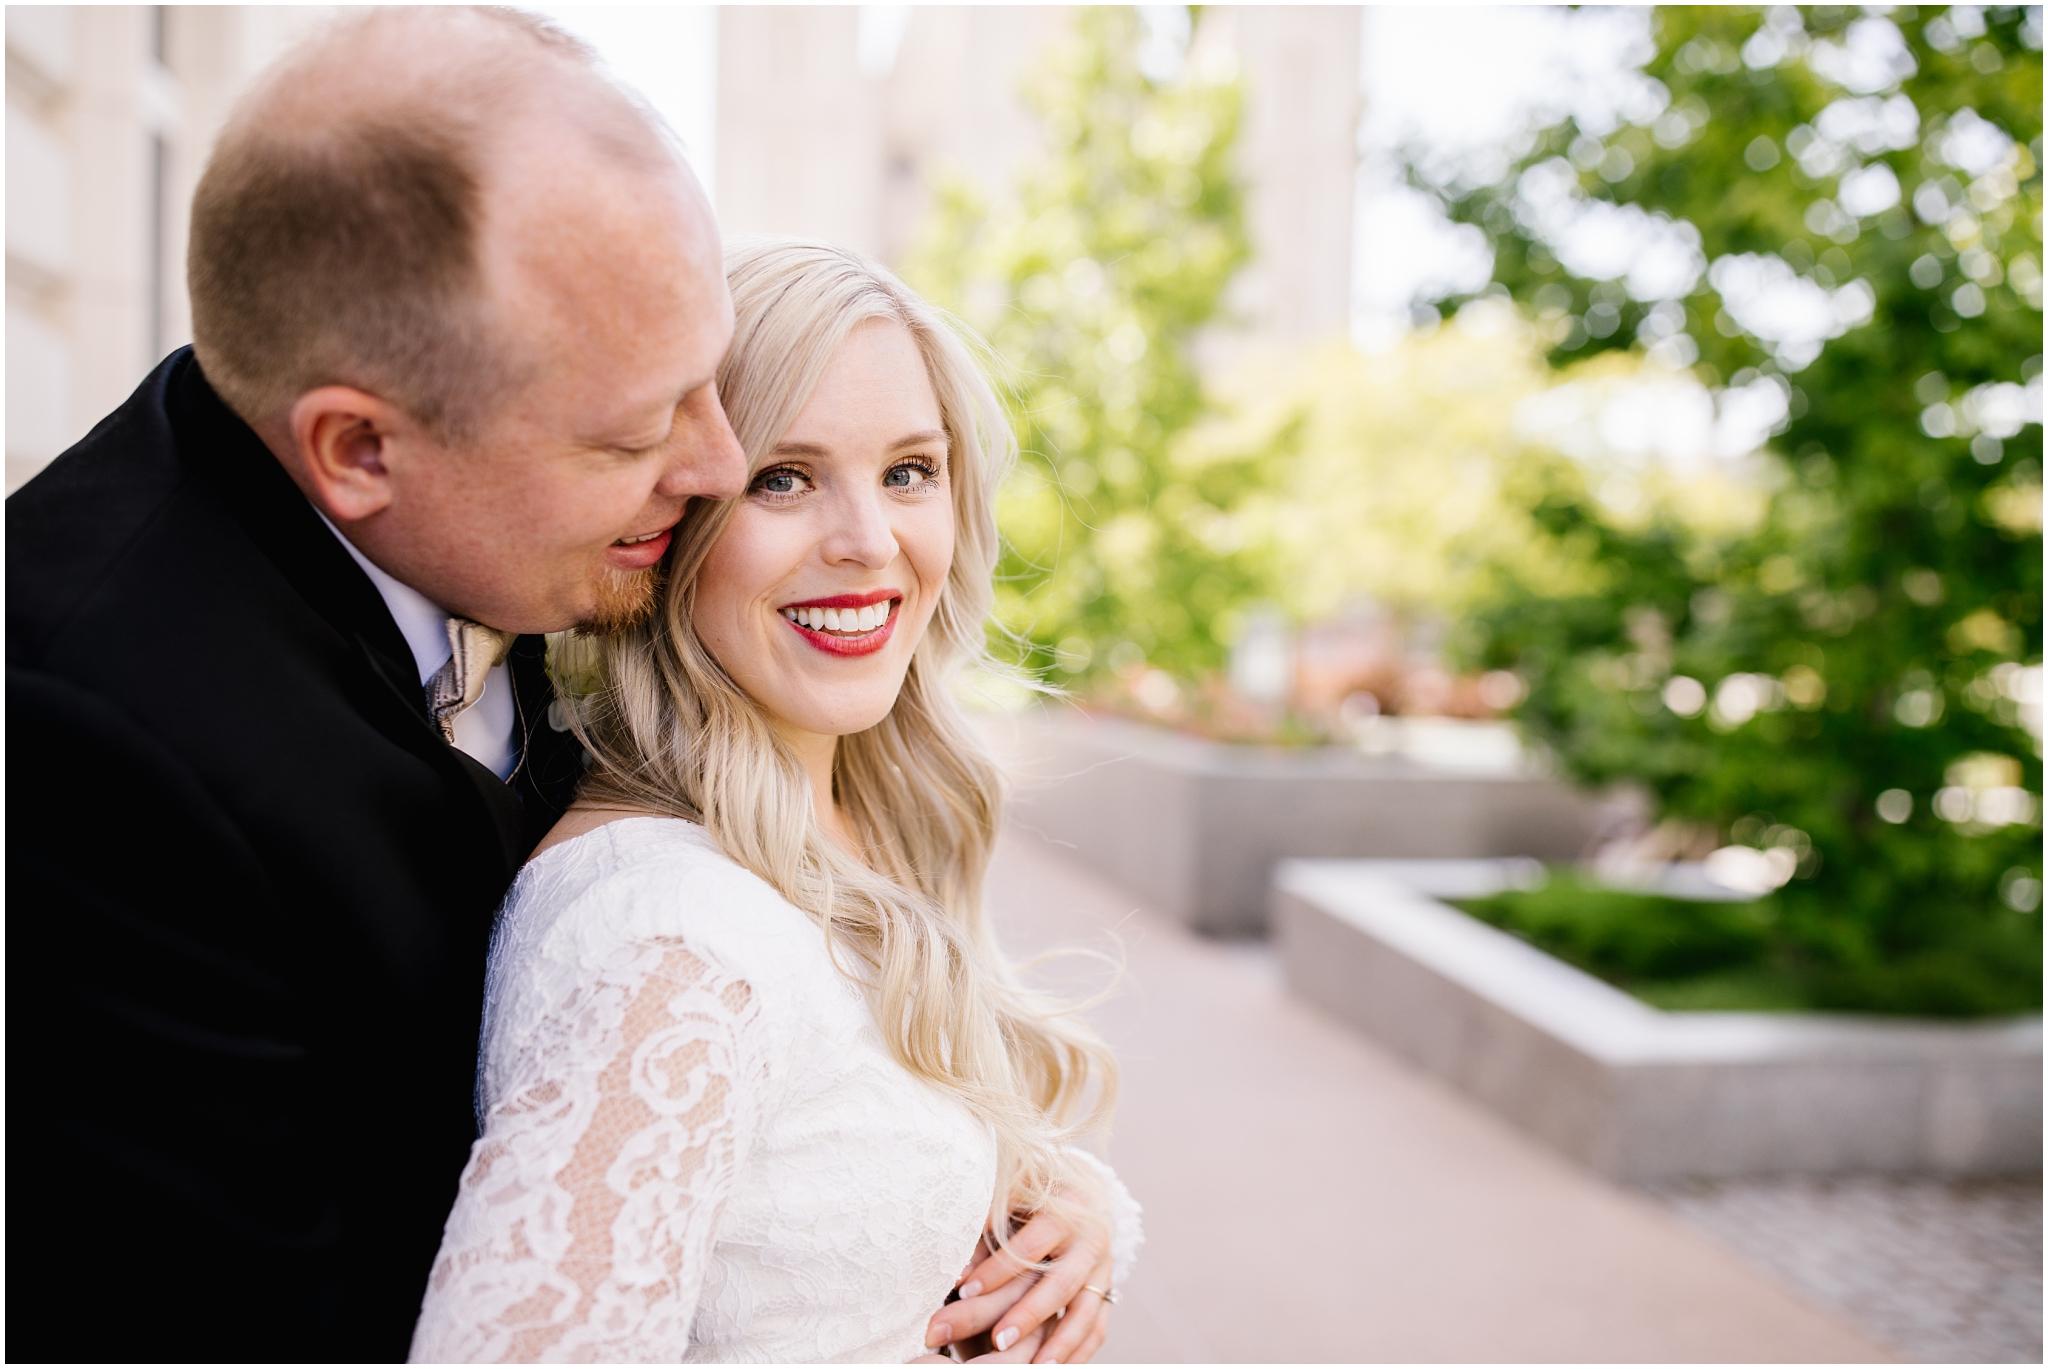 CherylandTyler-291_Lizzie-B-Imagery-Utah-Wedding-Photographer-Salt-Lake-City-Temple-Wells-Fargo-Building-Reception-1.jpg